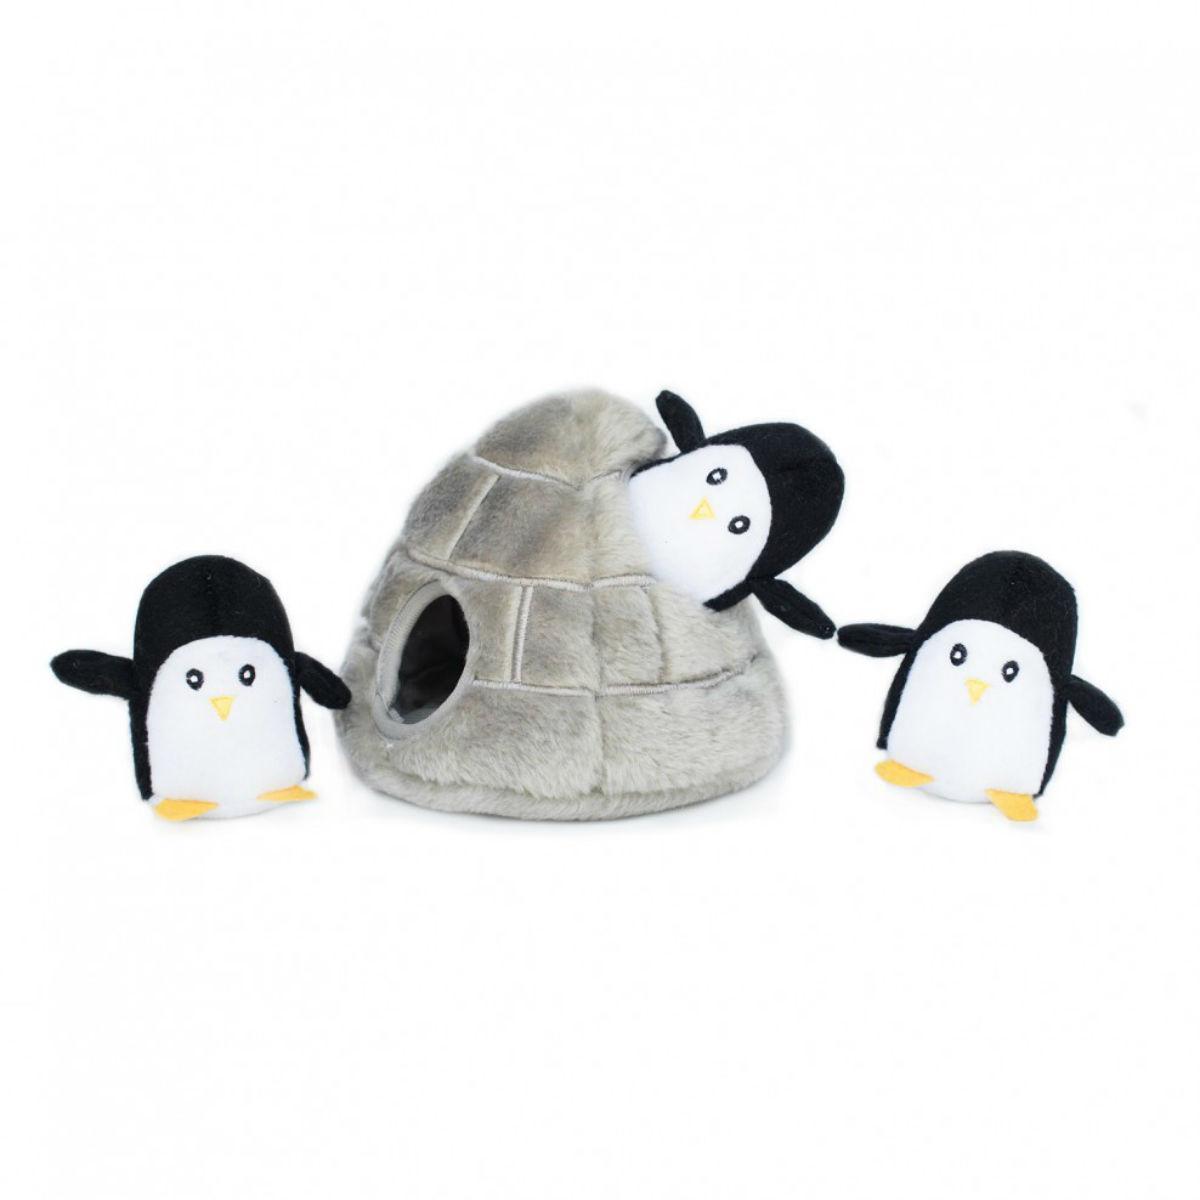 ZippyPaws Burrow Dog Toy - Penguin Cave